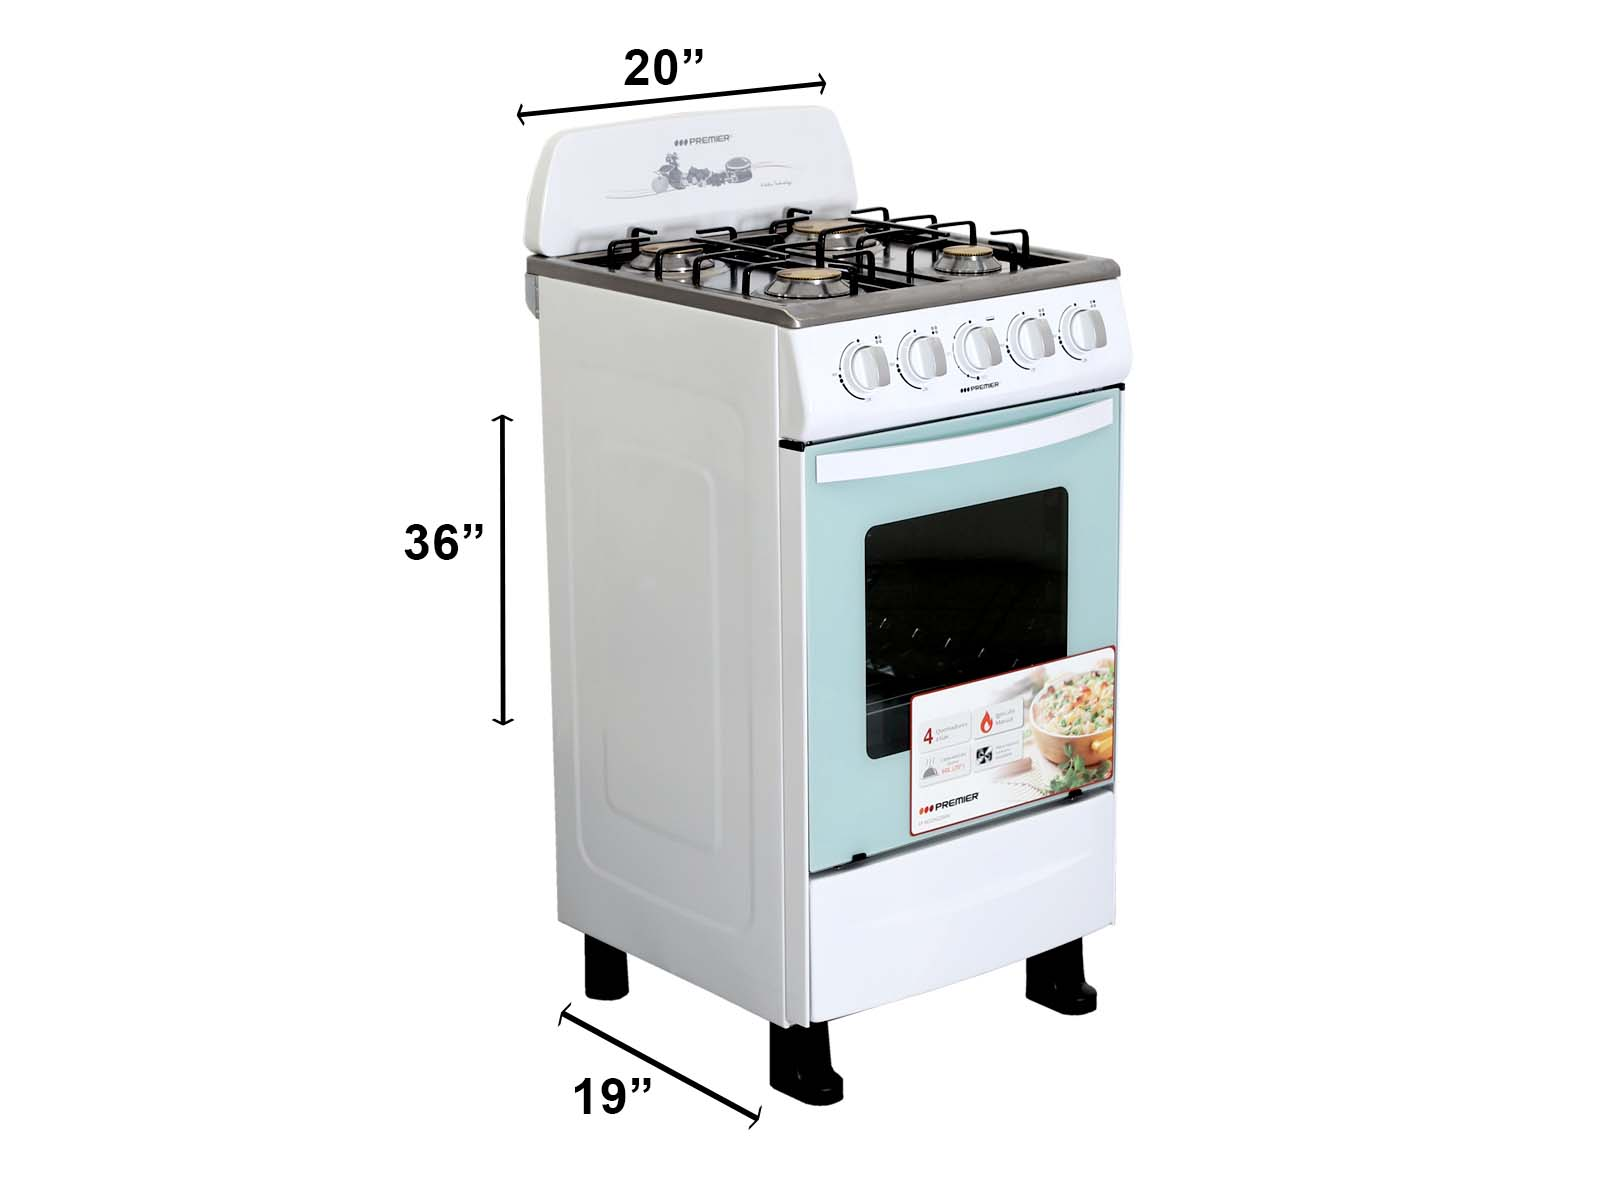 Imagen de producto Estufa a gas 20